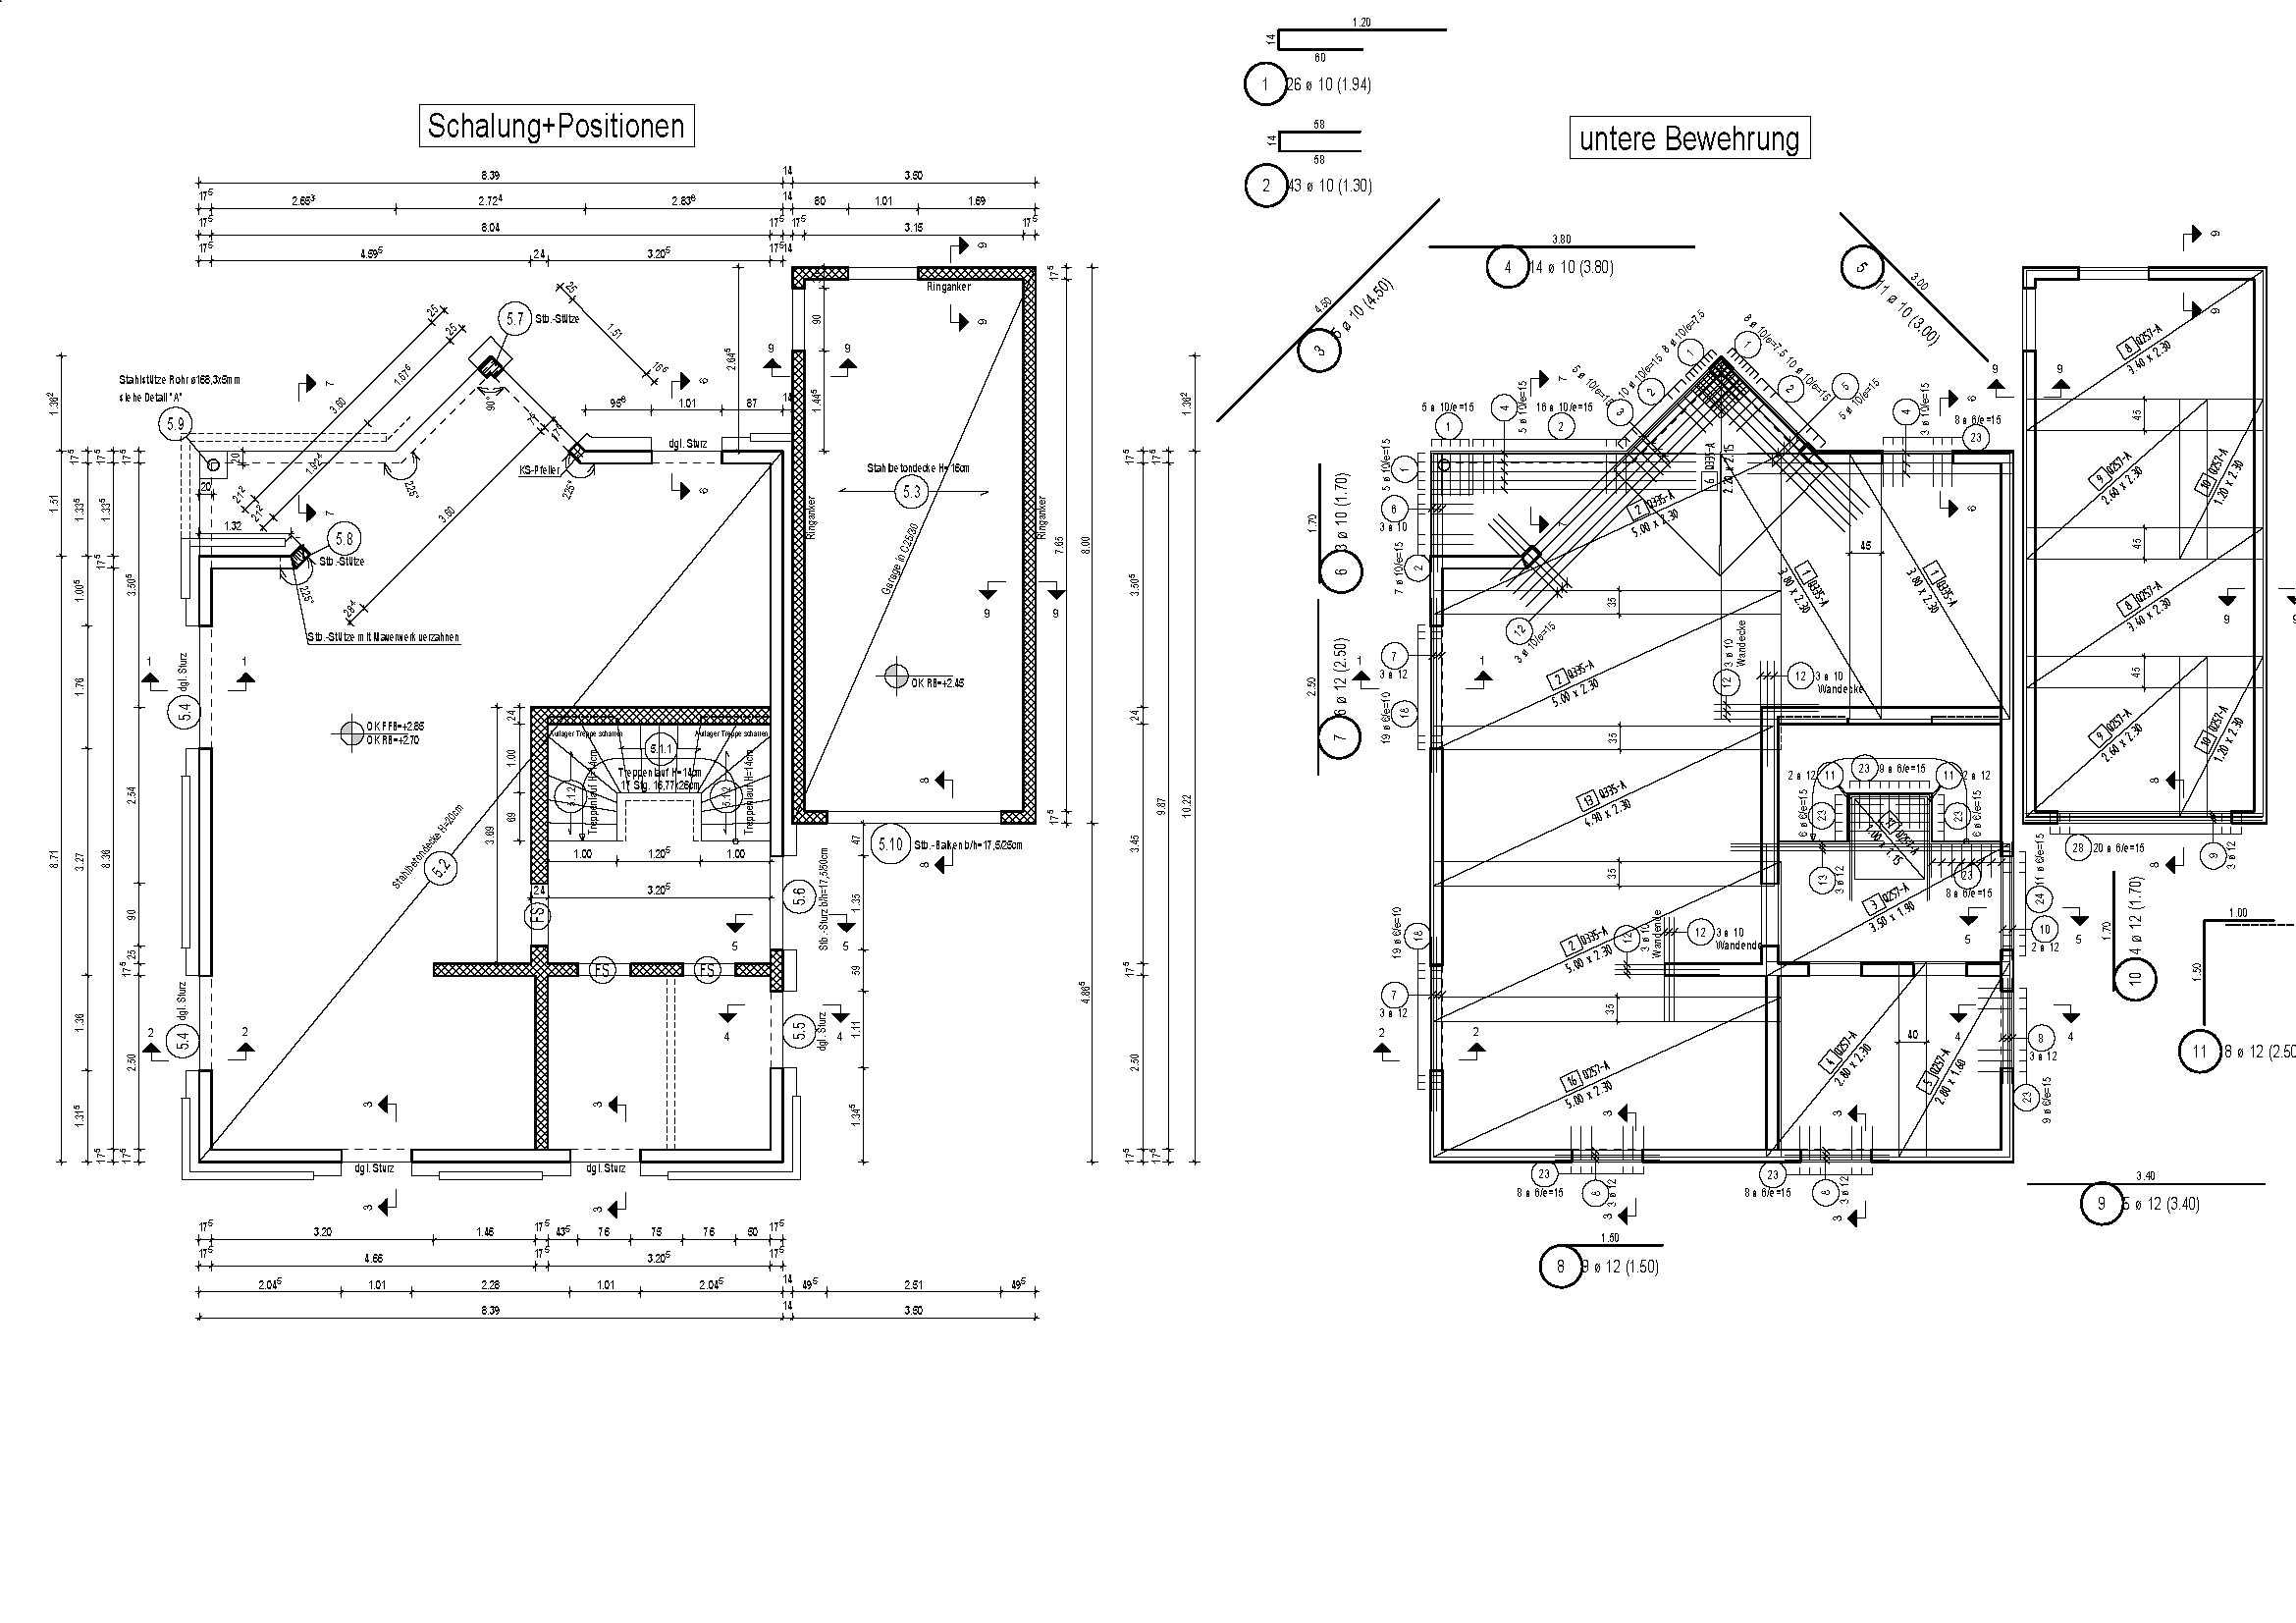 Gut bekannt Meine Projekte - BDH AL43